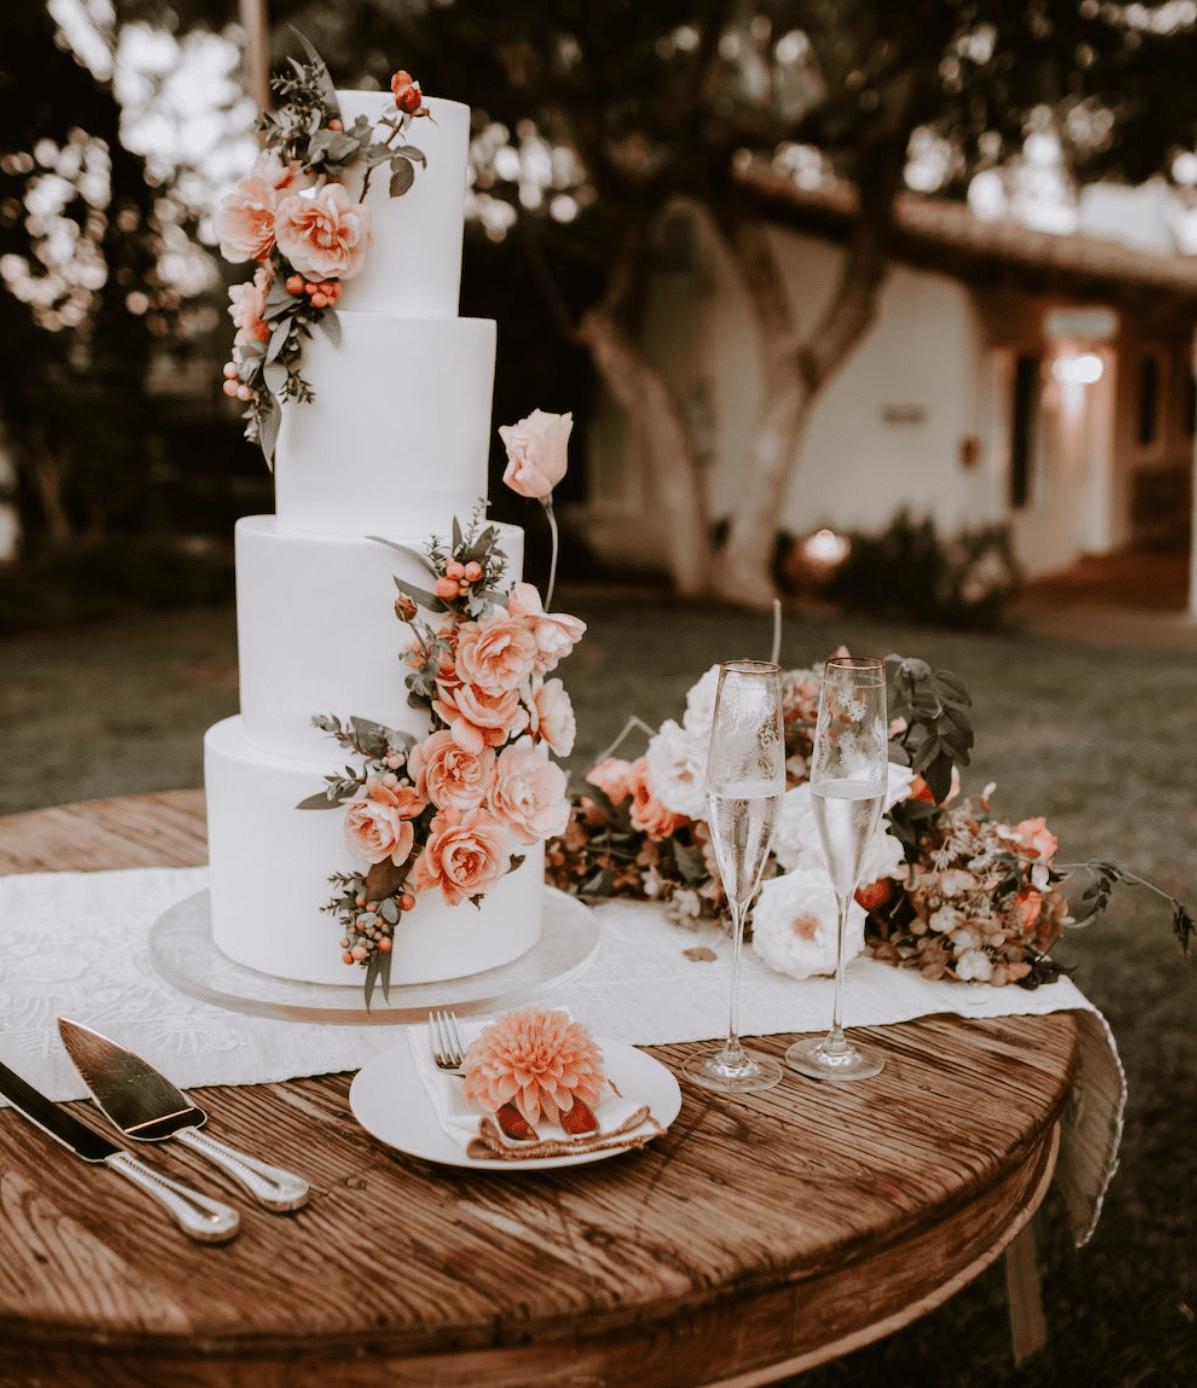 Beautiful Wedding Cakes: Incredible American Wedding Traditions to follow